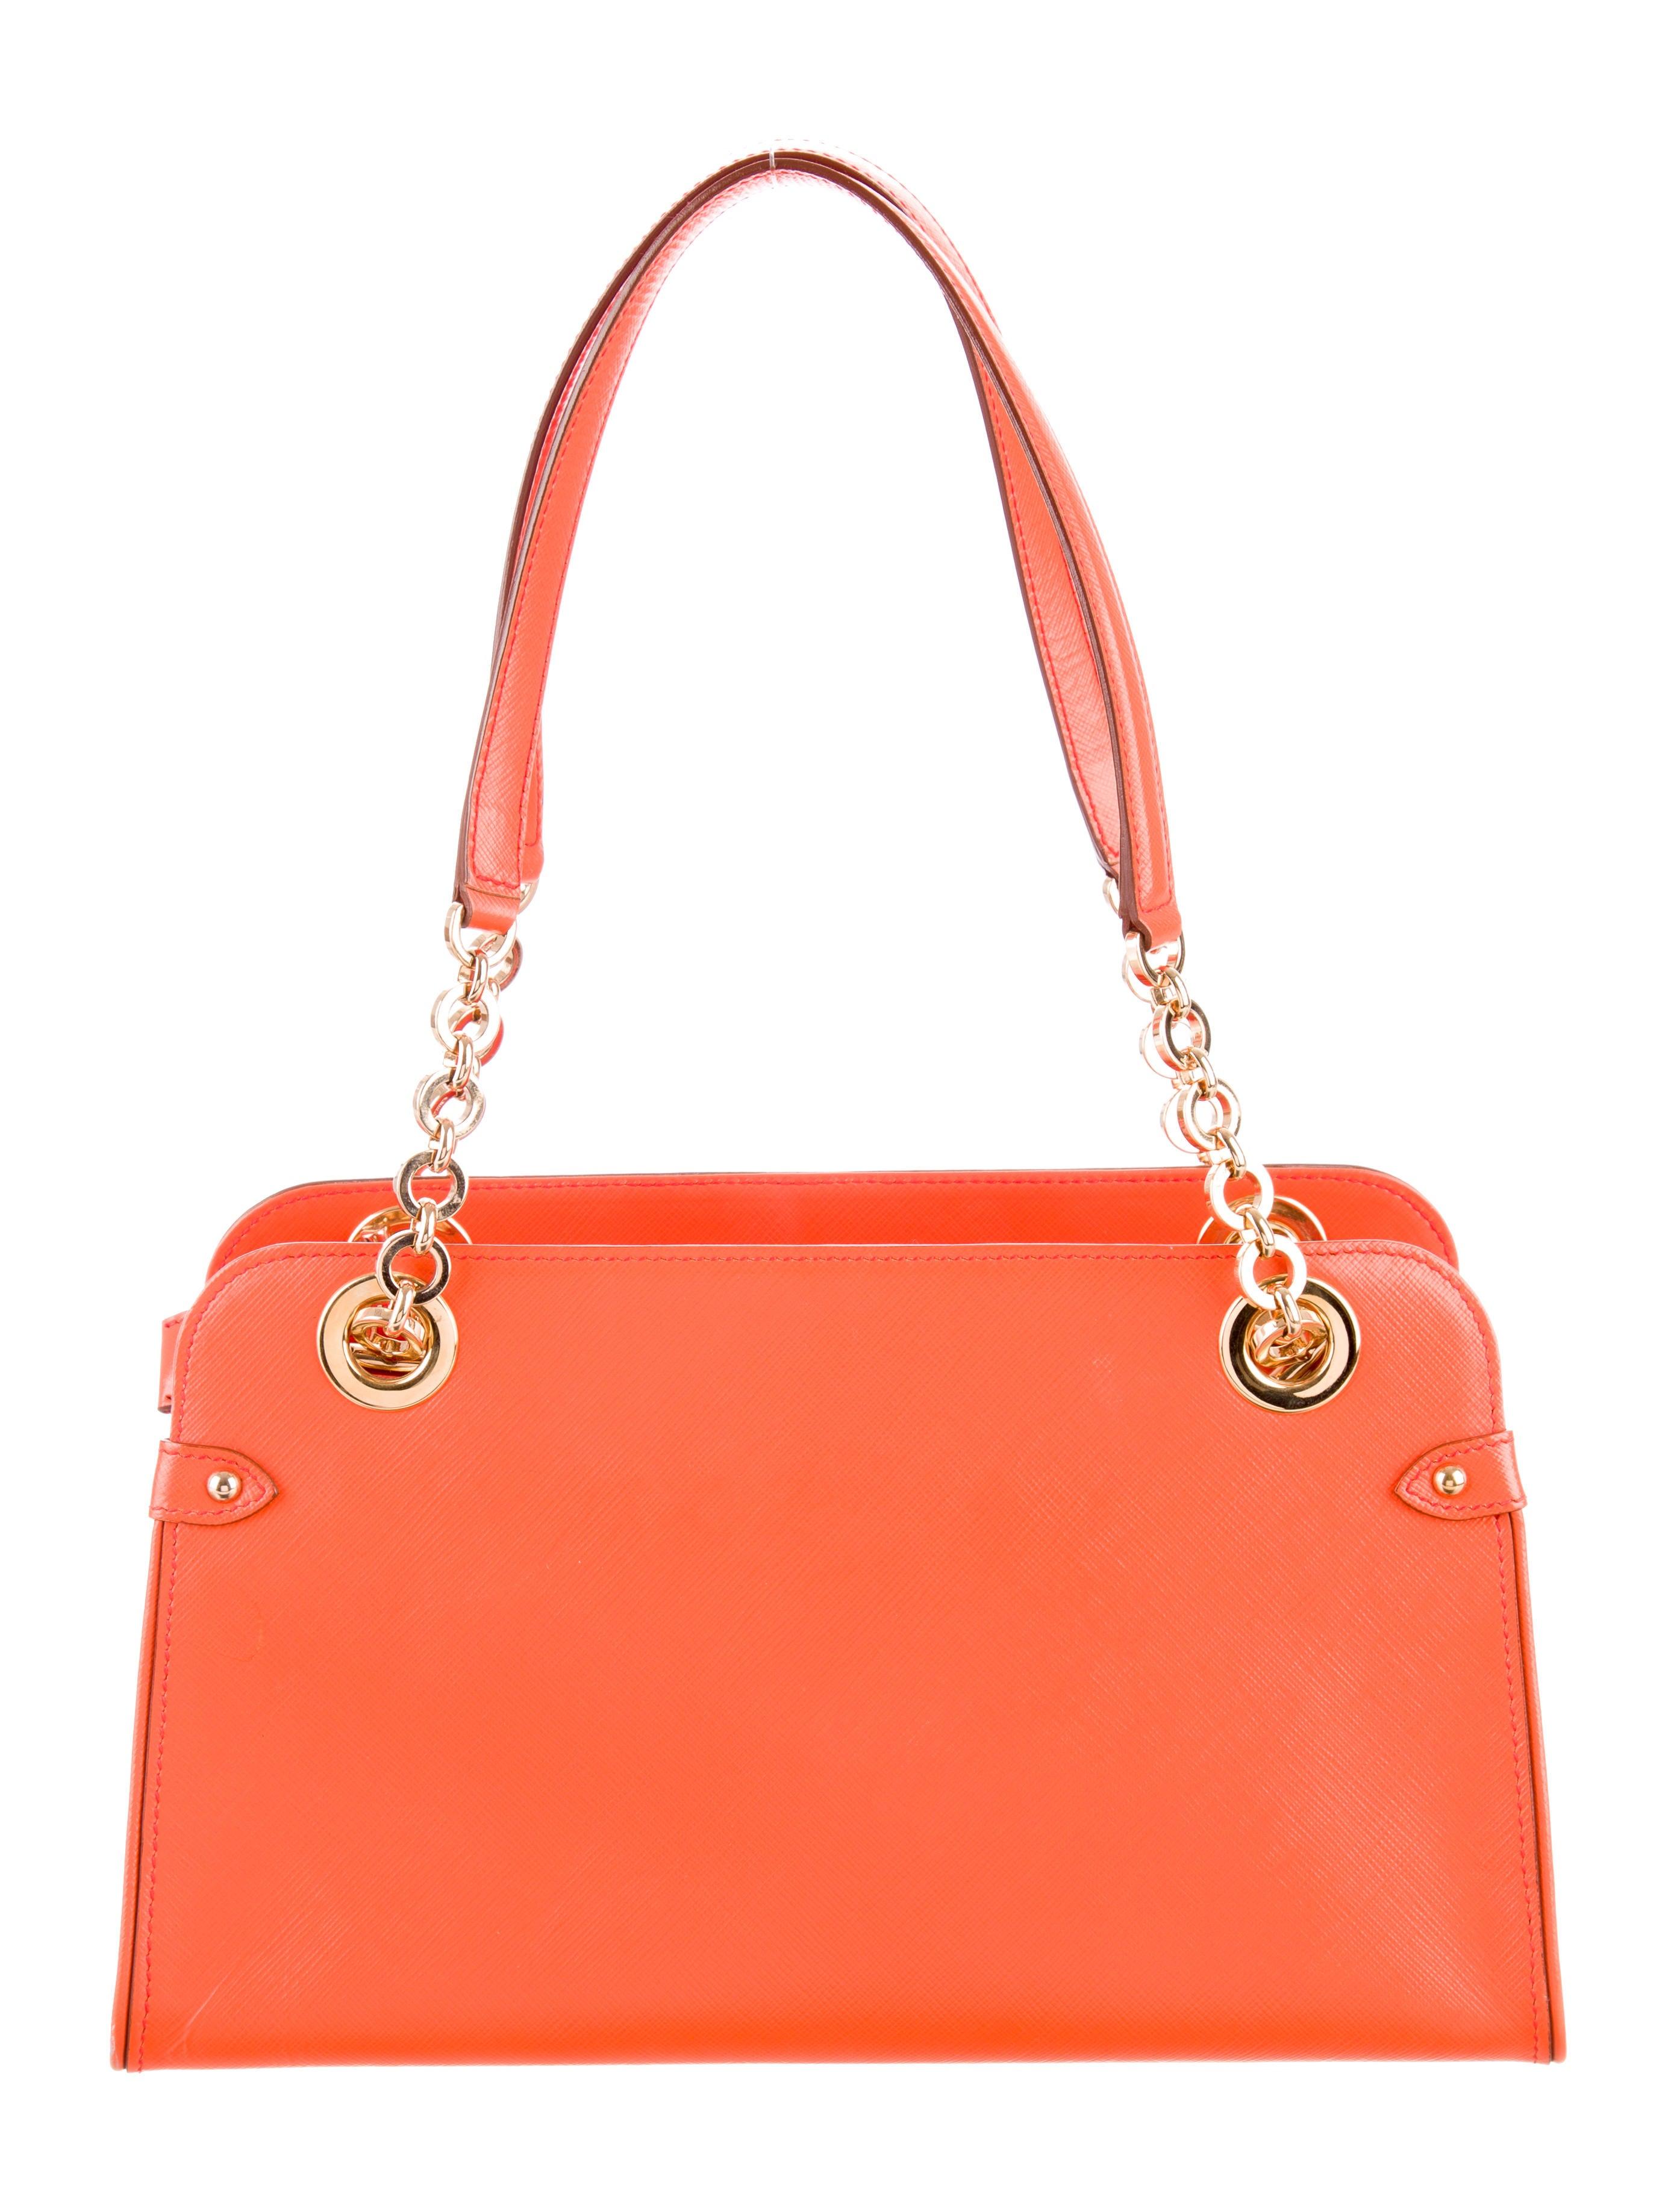 Salvatore Ferragamo Gancini Tote Bag - Handbags - SAL46196  abbdd27ce2422